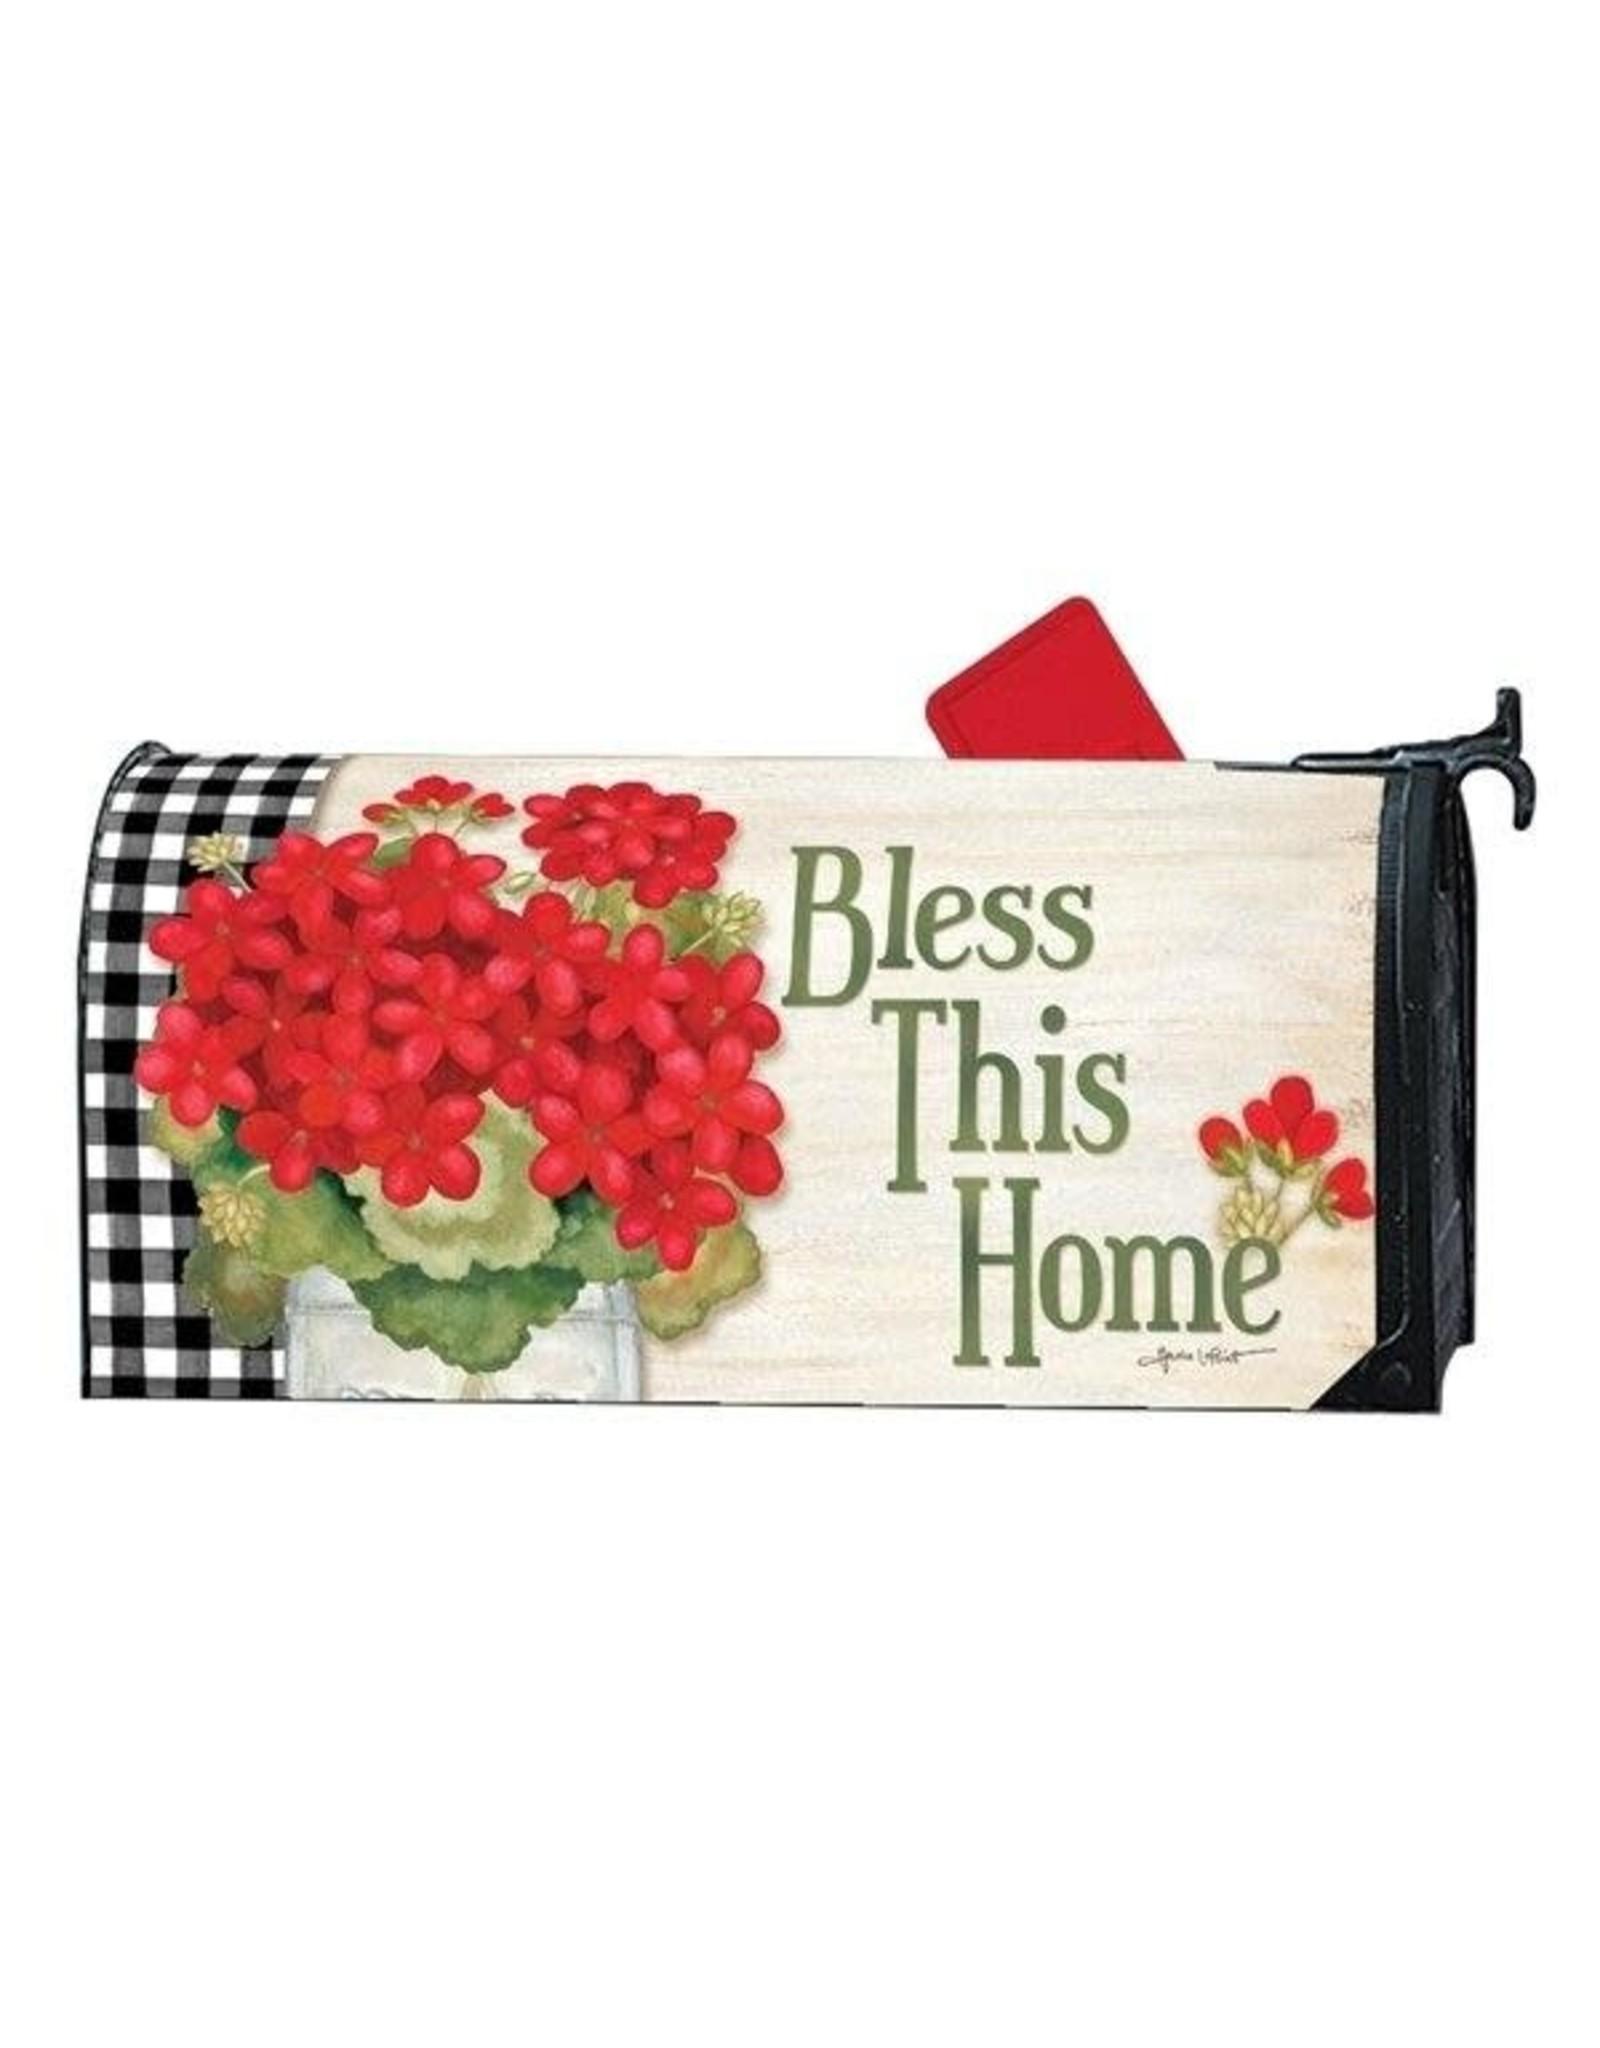 Magnet Works Mailbox Wrap, Geranium Blooms, 6.5x19